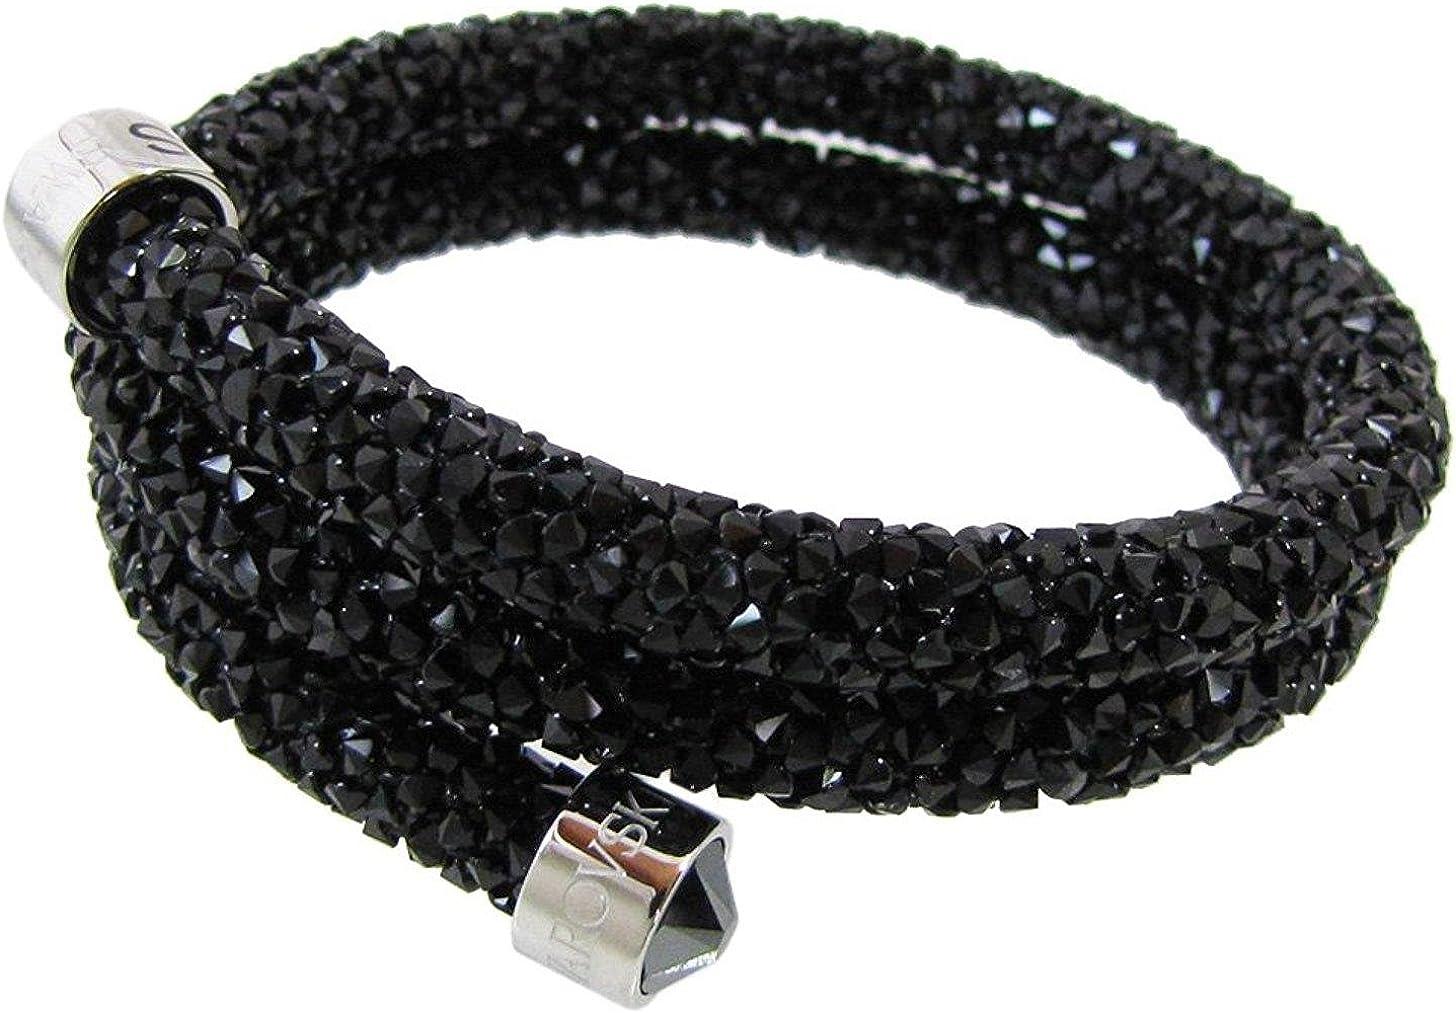 Parity > swarovski crystaldust double bangle black, Up to 63% OFF